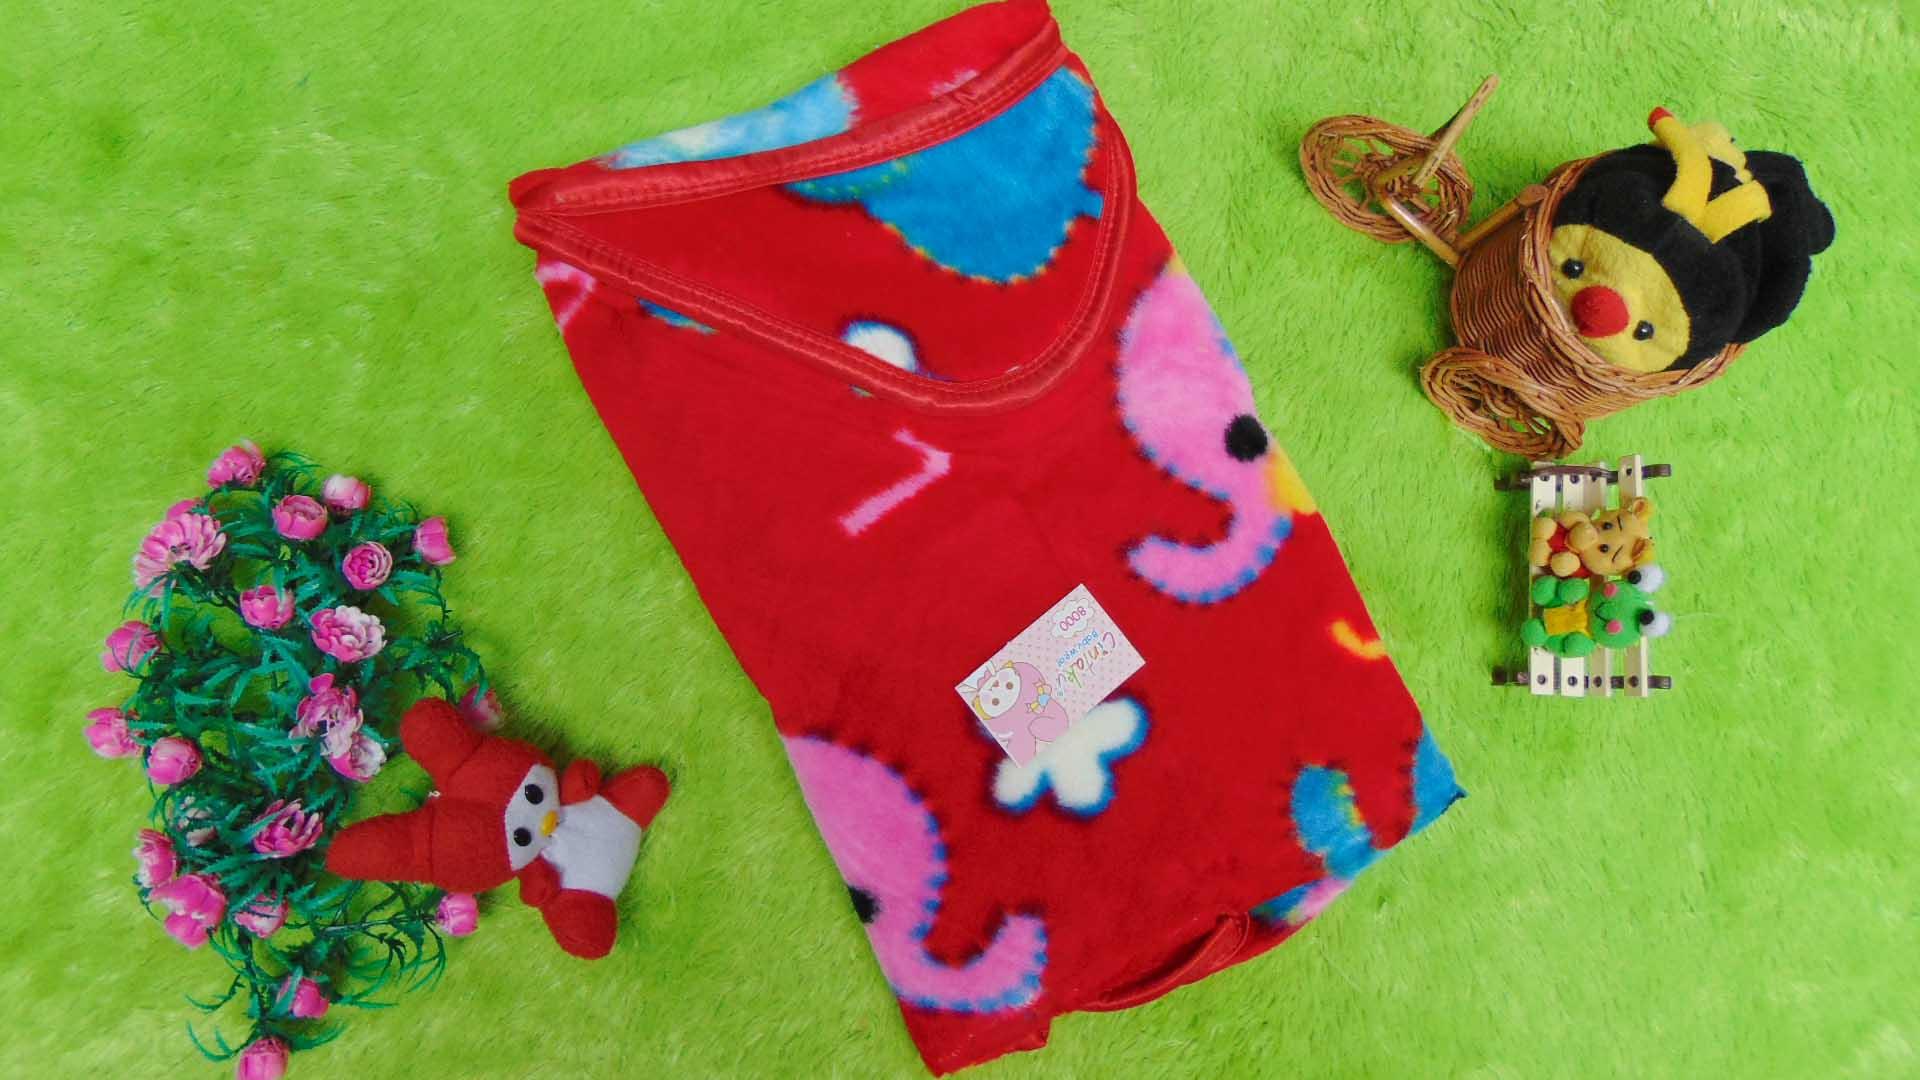 kado bayi selimut bayi bulu topi selimut bepergian bayi bludru lembut motif gajah merah 40 bahan lembut cocok sebagai pelindung bayi ketika bepergian